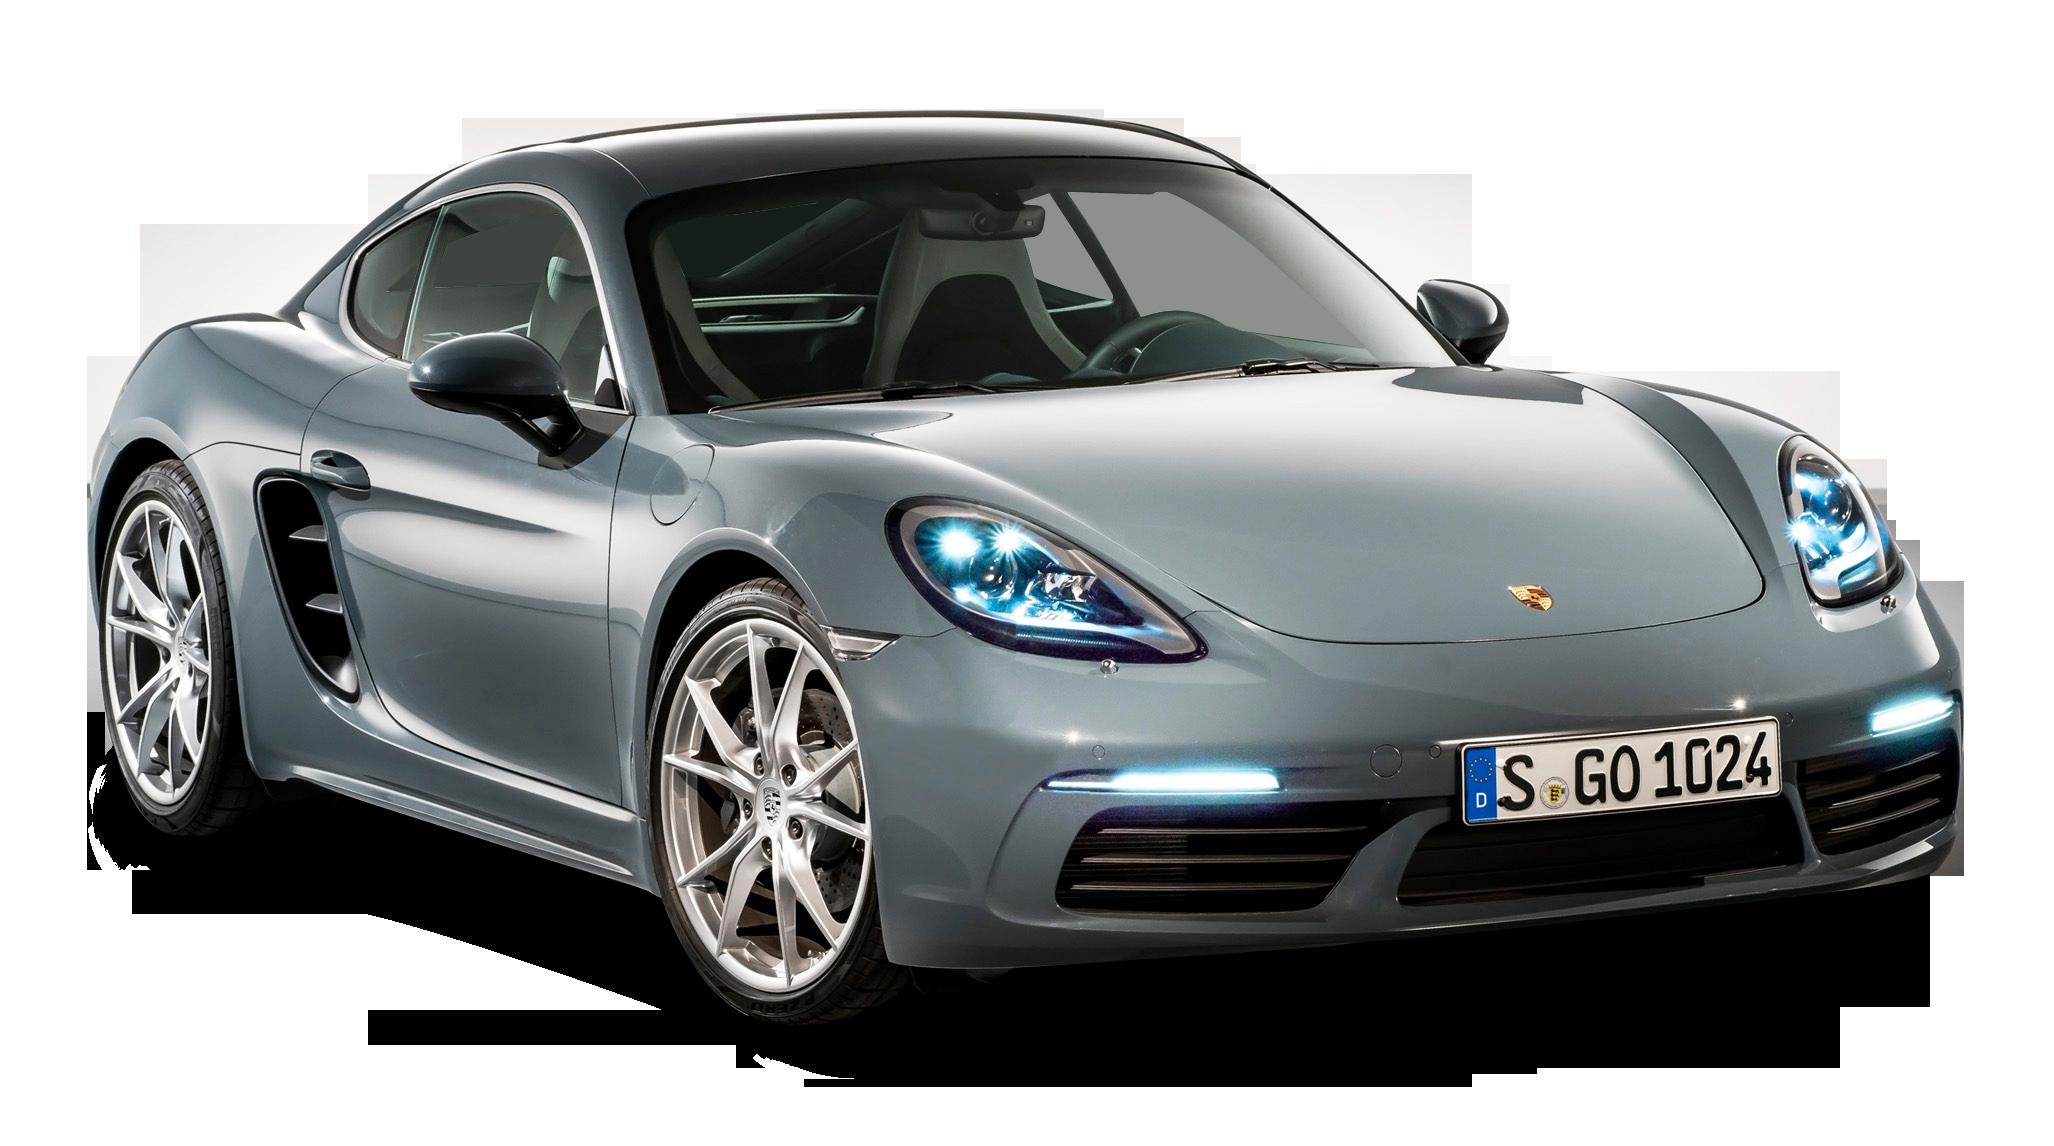 Grey Porsche 718 Cayma Car Png Image Car Side View Car Porsche